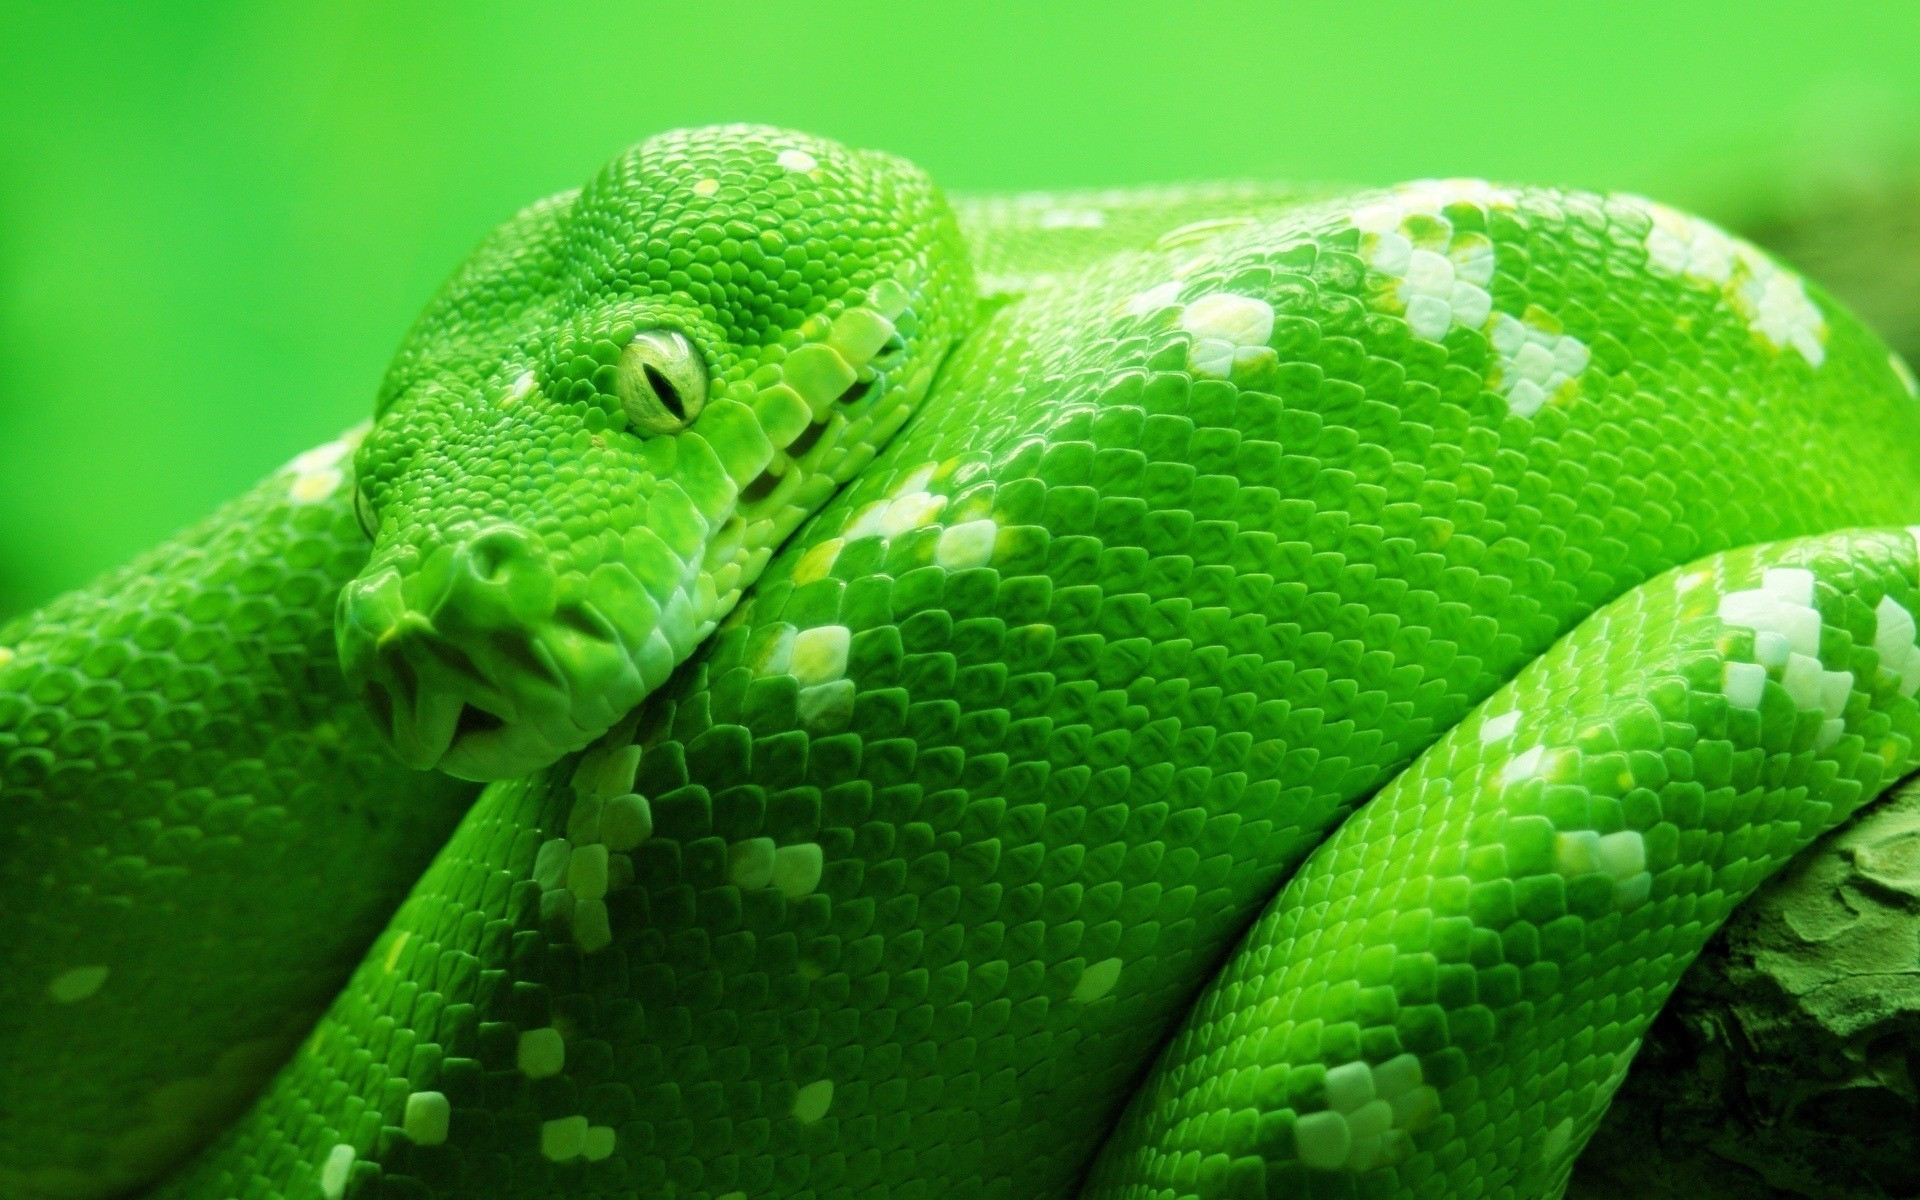 16k resolution wallpaper wallpapersafari - Green snake hd wallpaper ...